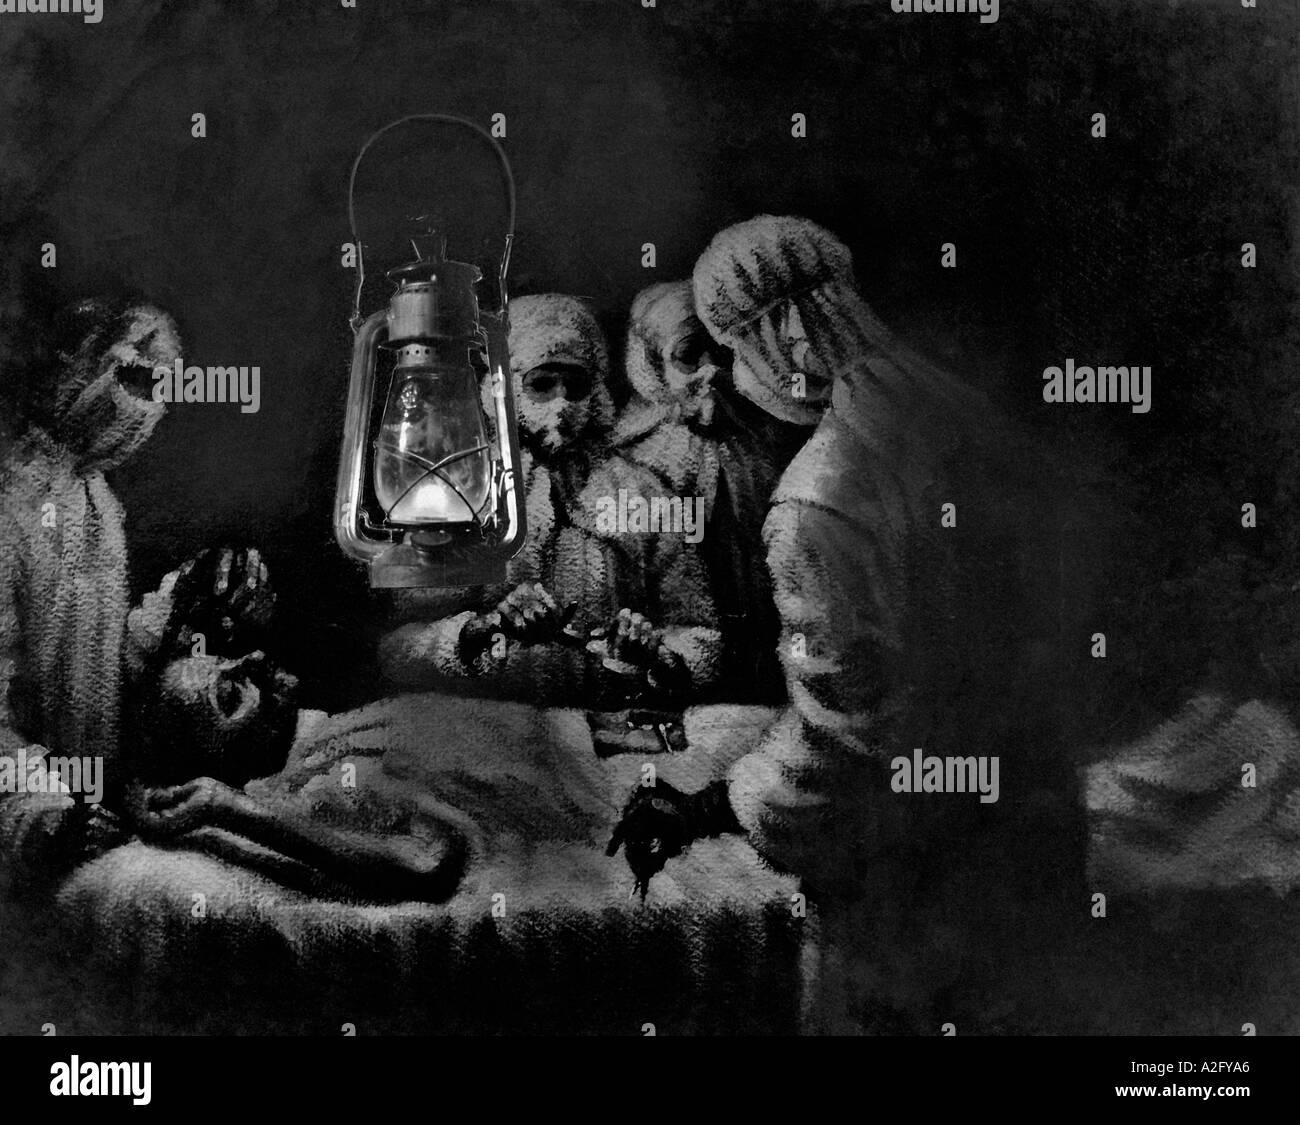 MKG32996 Painting of Gandhis appendicitis operation by kerosene lamp 1924 - Stock Image